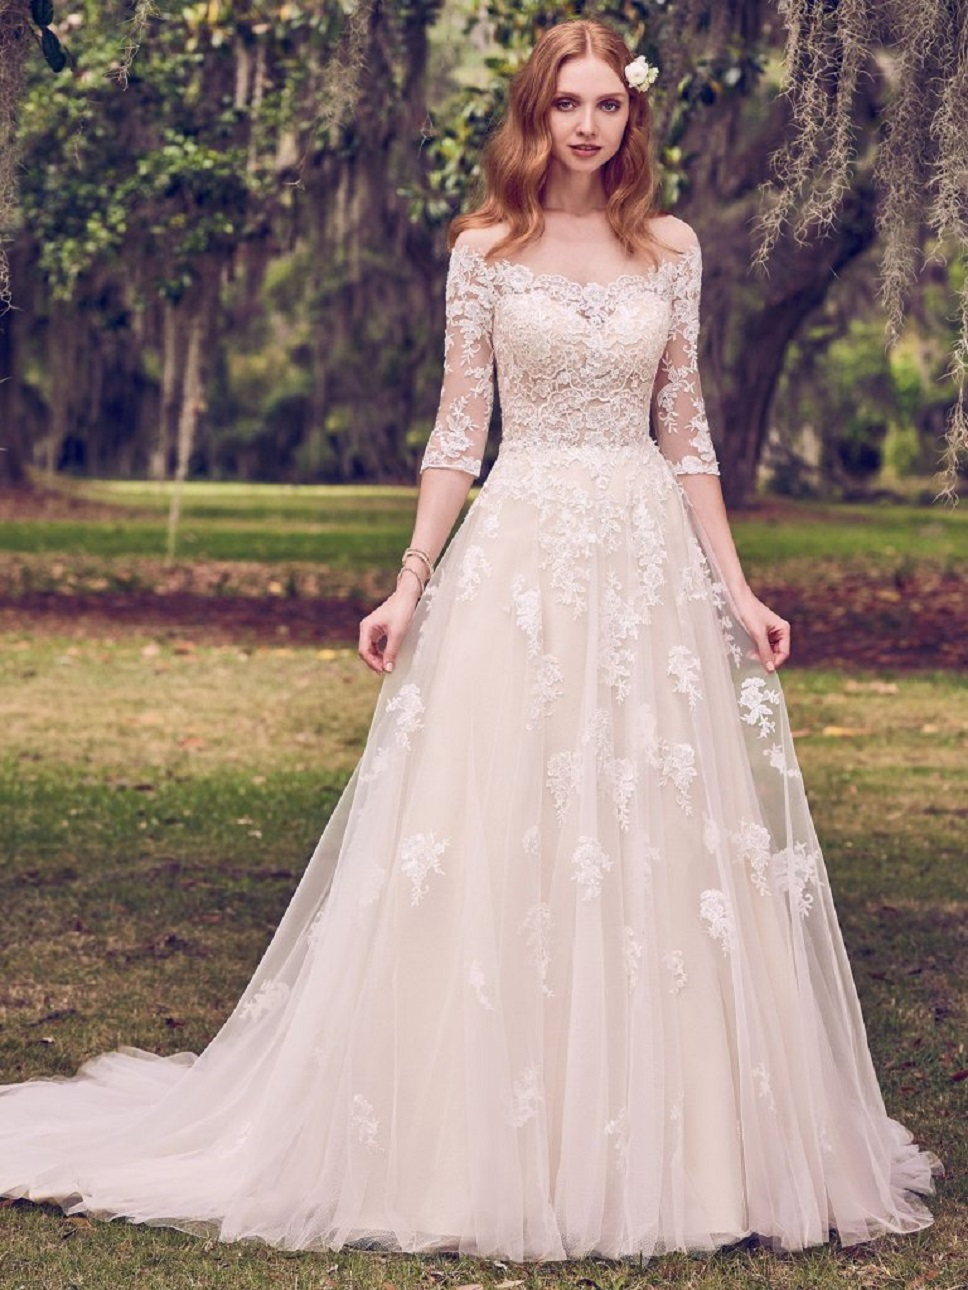 Cool & Perfect Wedding Dress